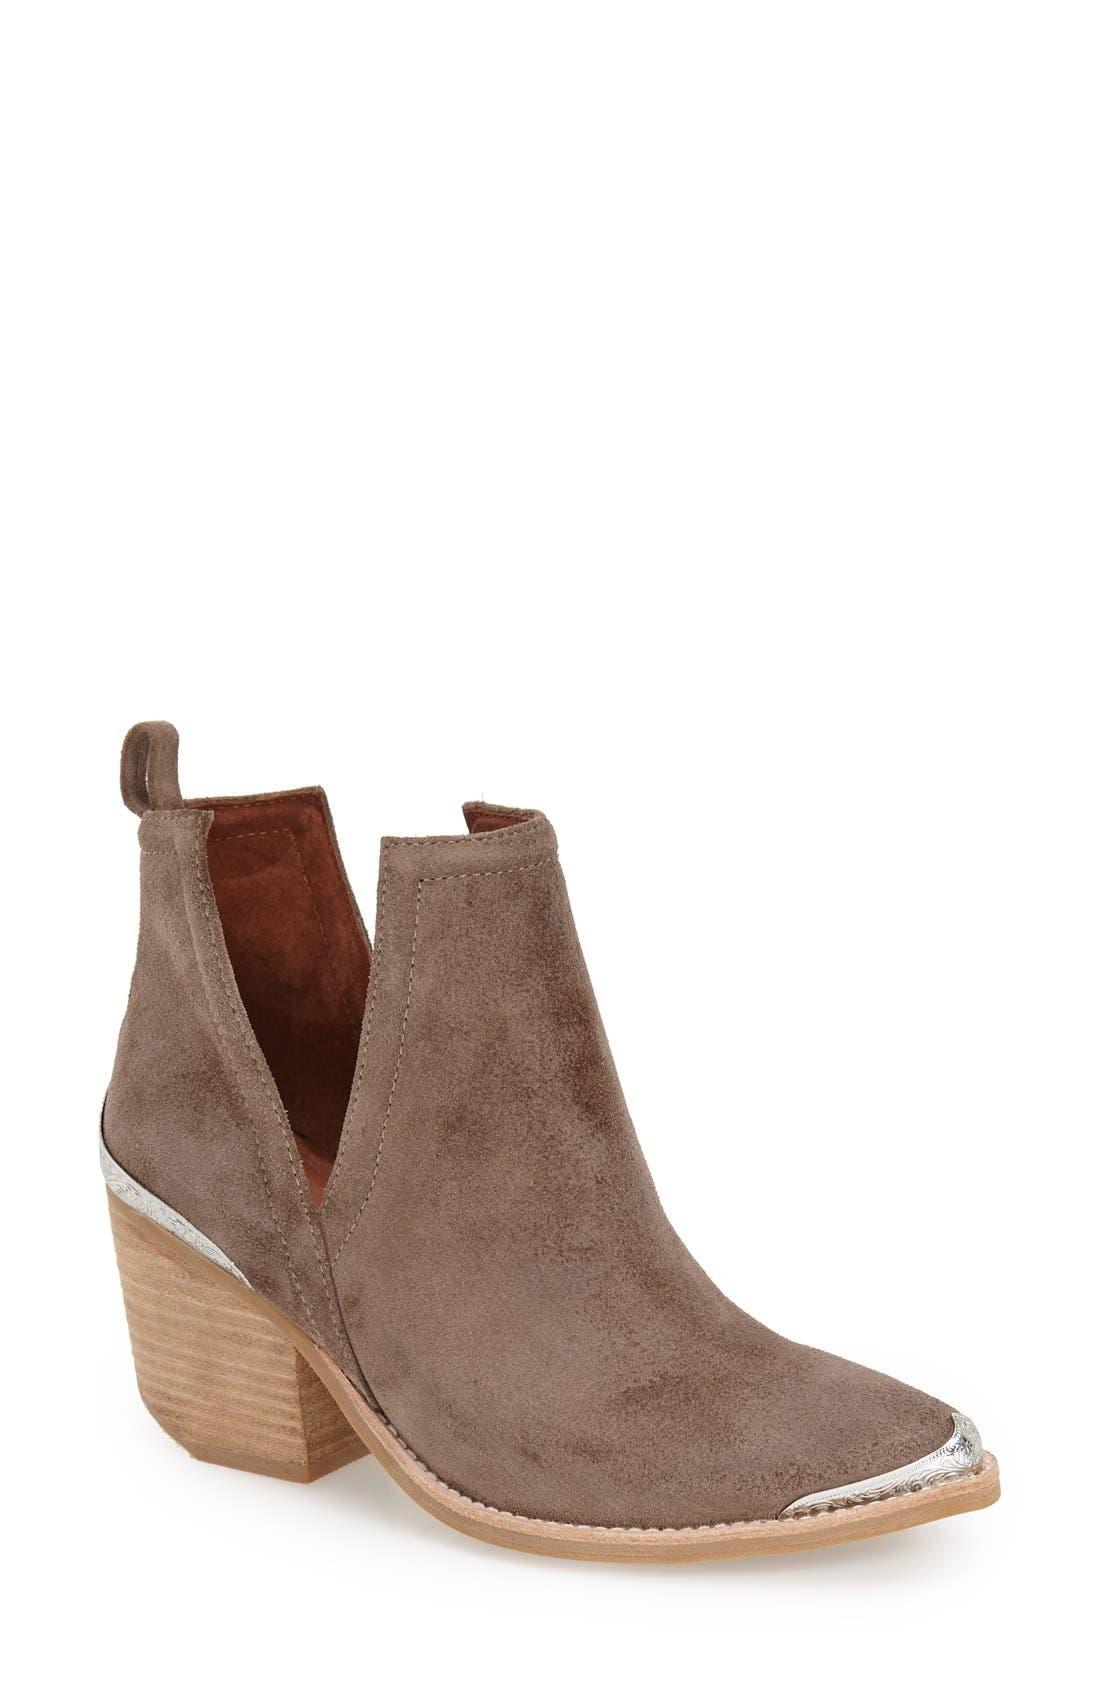 Alternate Image 1 Selected - Jeffrey Campbell Cromwell Cutout Western Boot (Women)